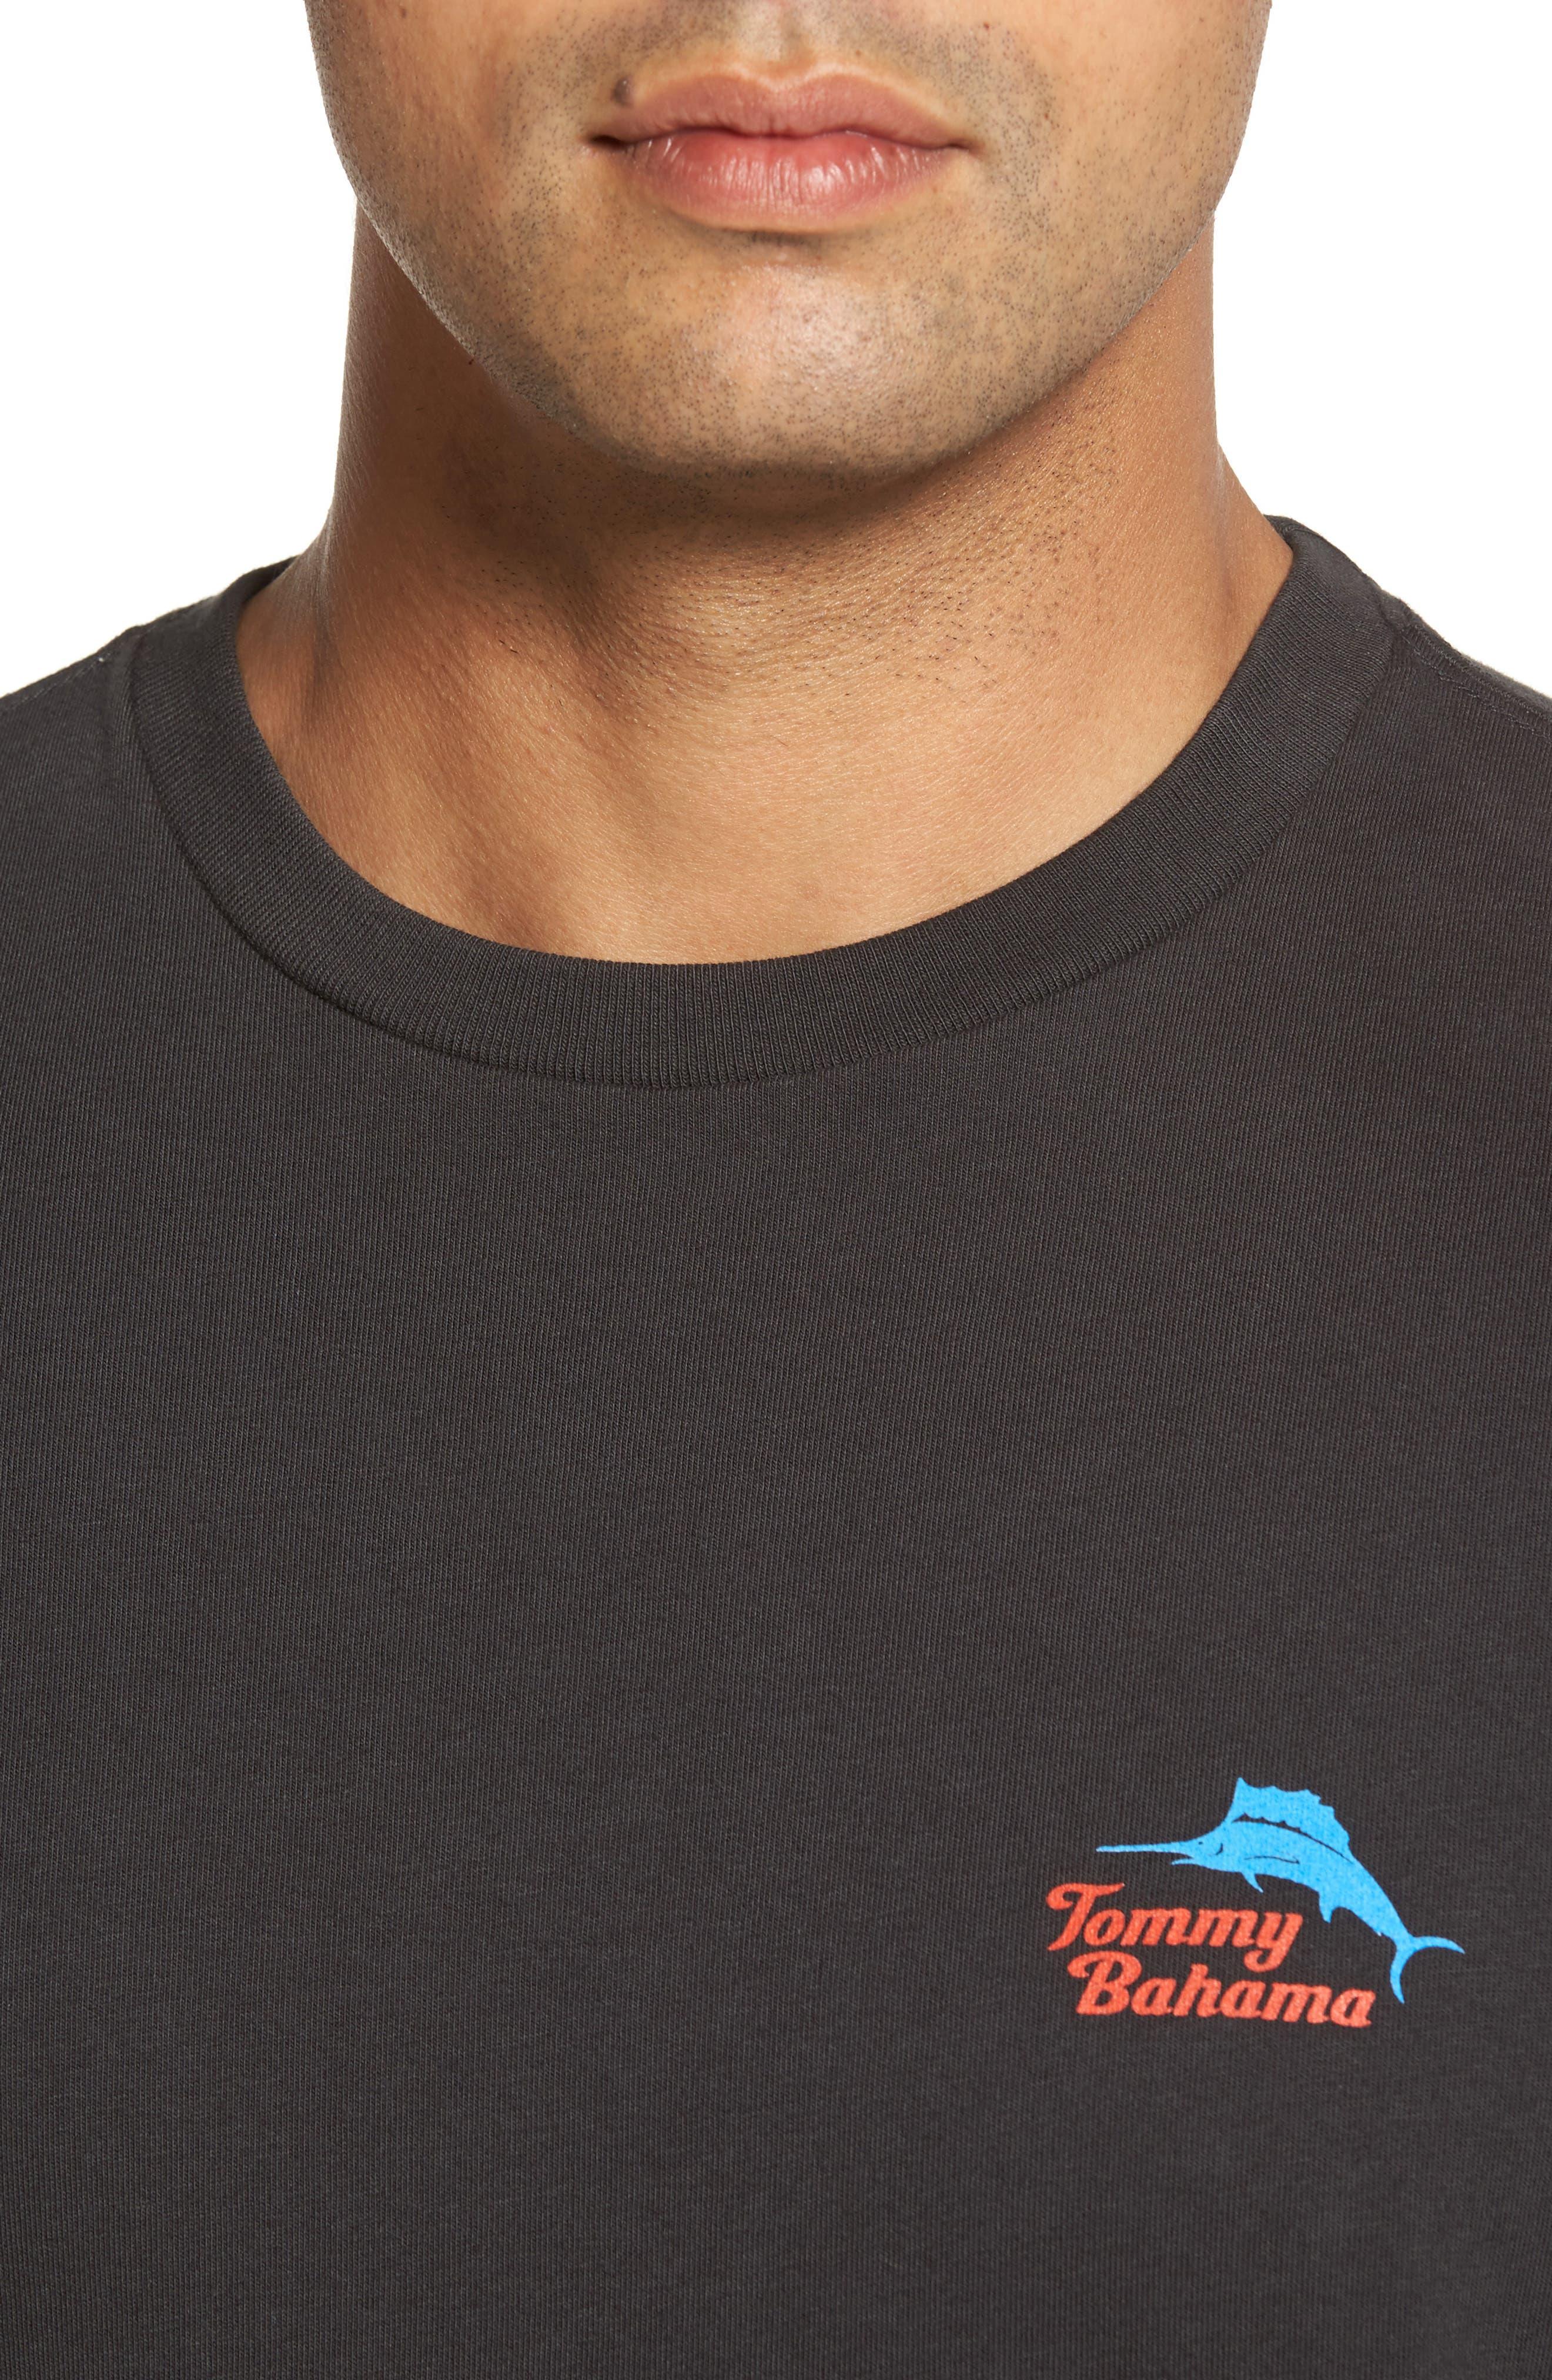 Bands Back T-Shirt,                             Alternate thumbnail 4, color,                             Coal